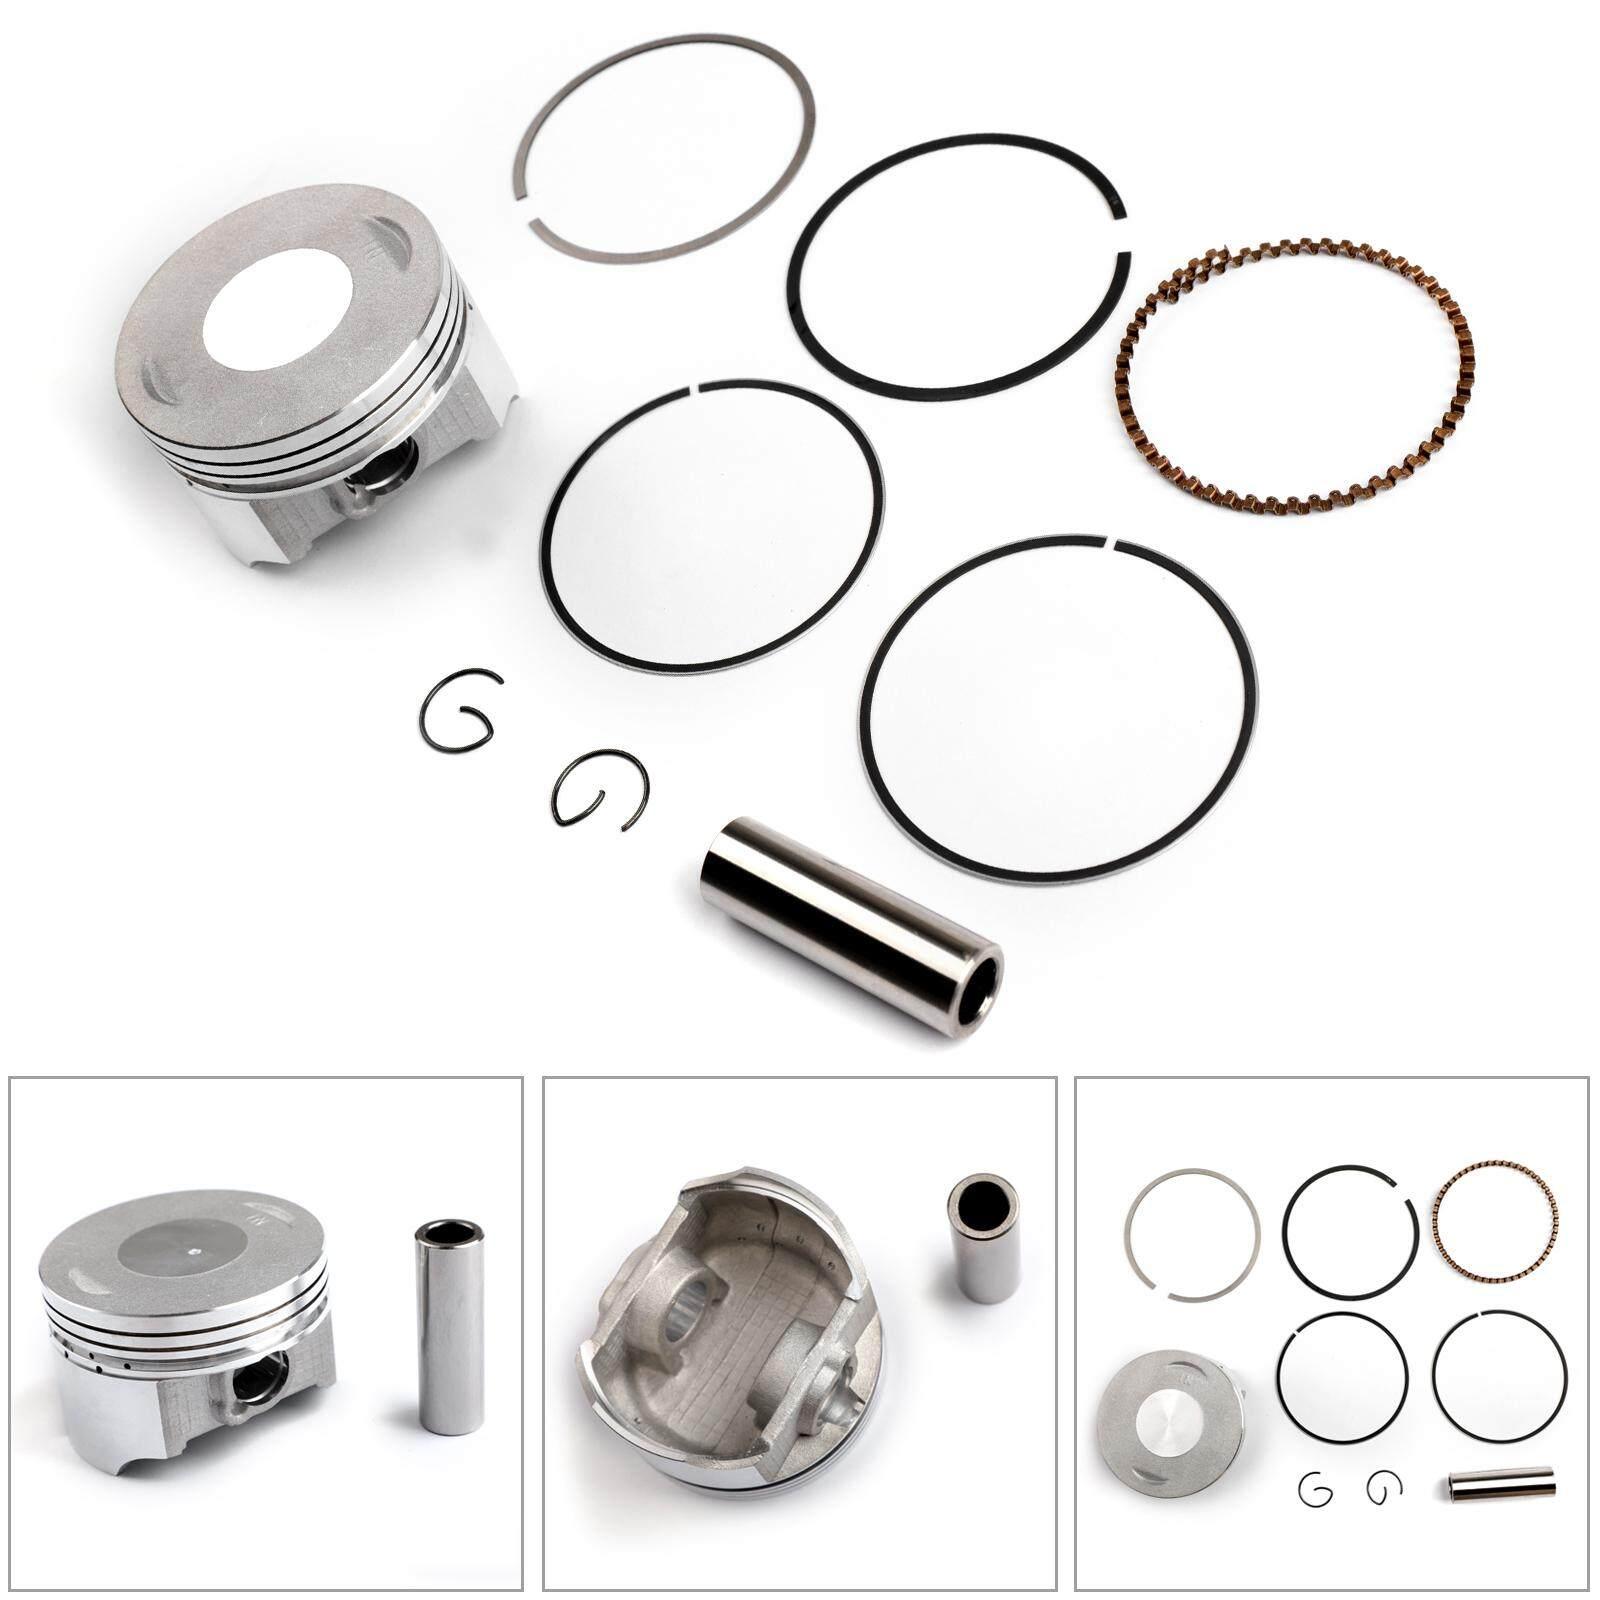 Piston Parts for sale - Car Pistons online brands, prices & reviews